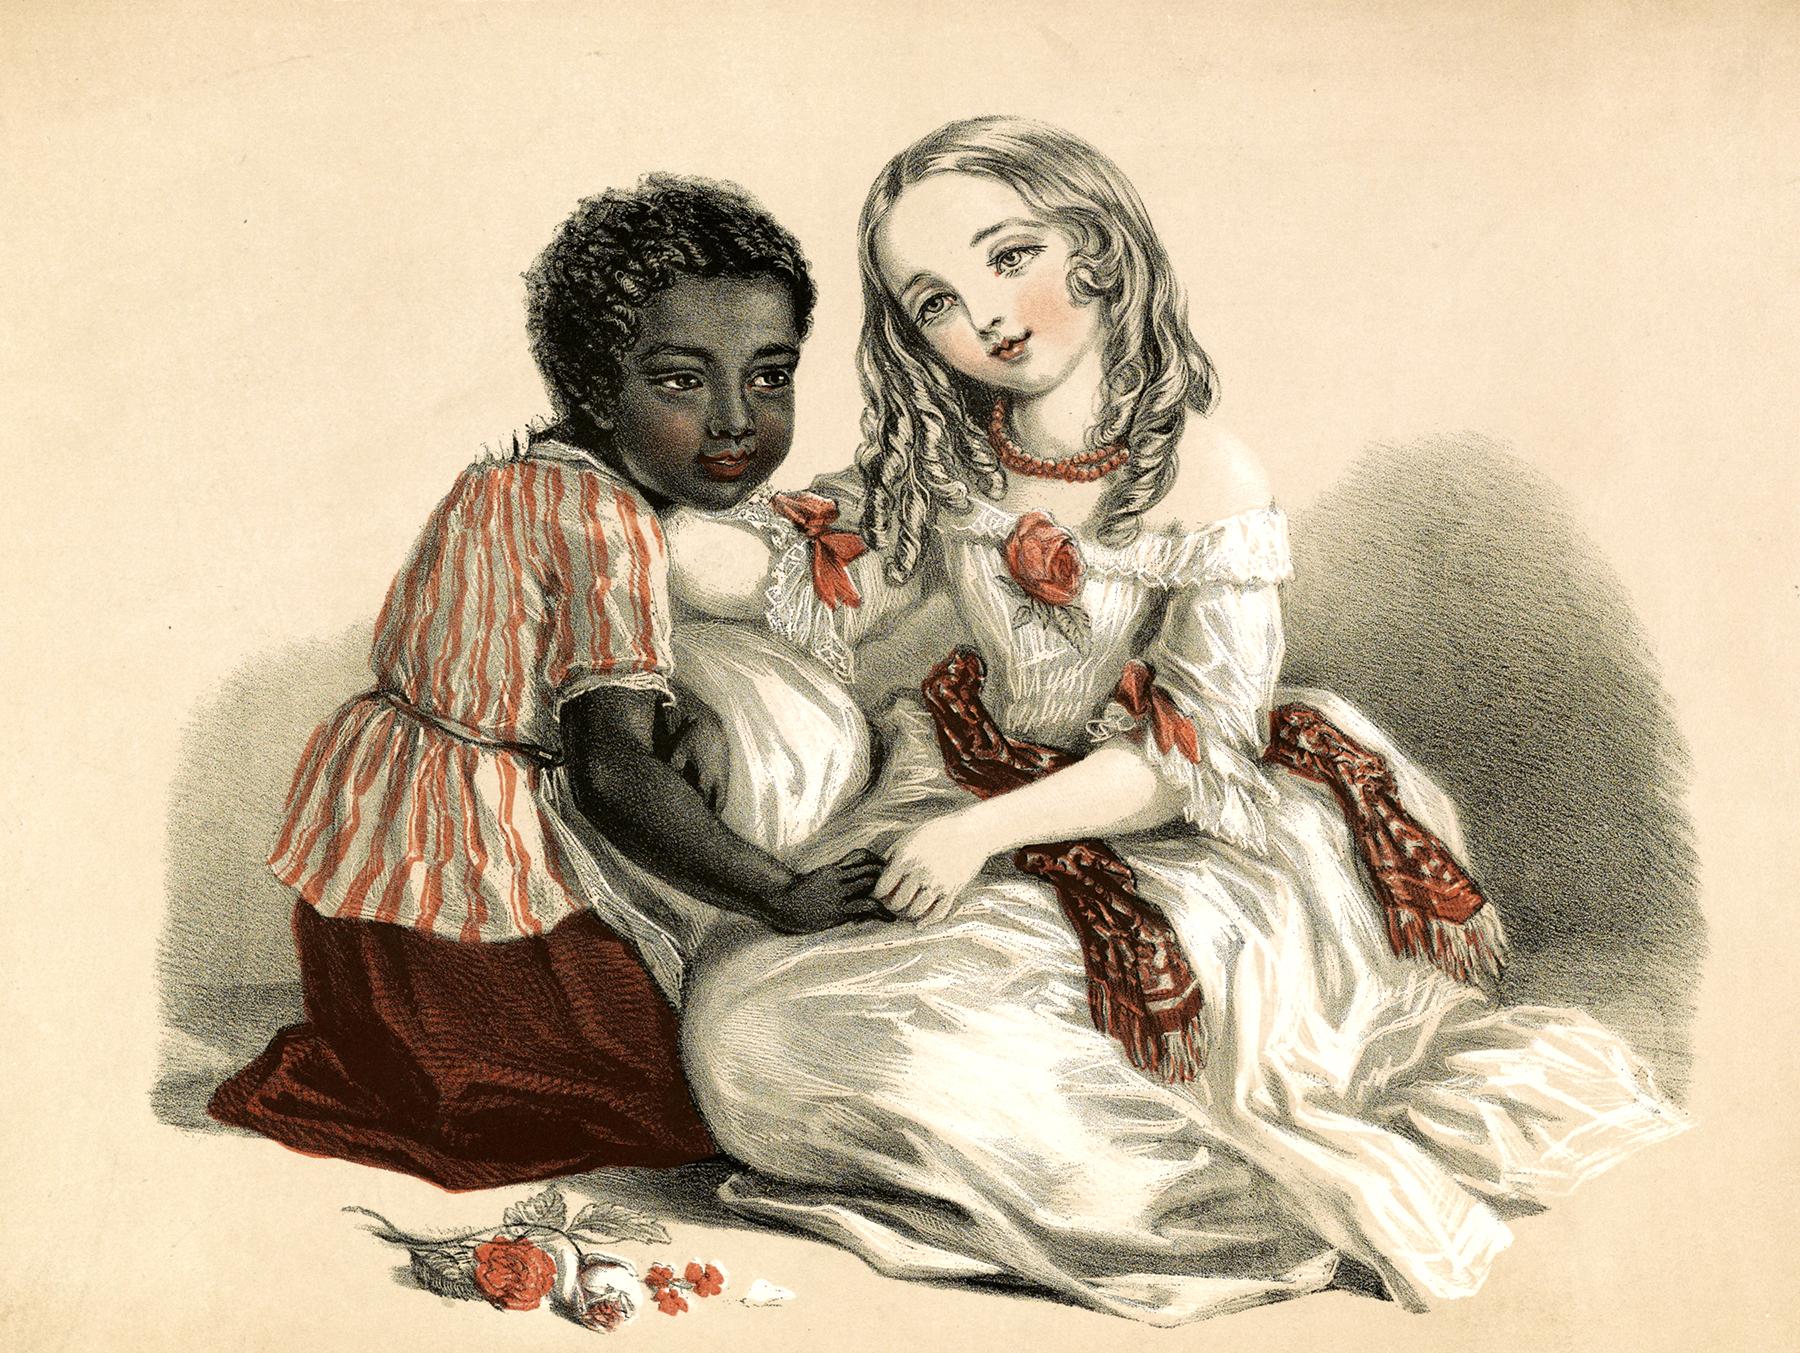 Darling Children Image